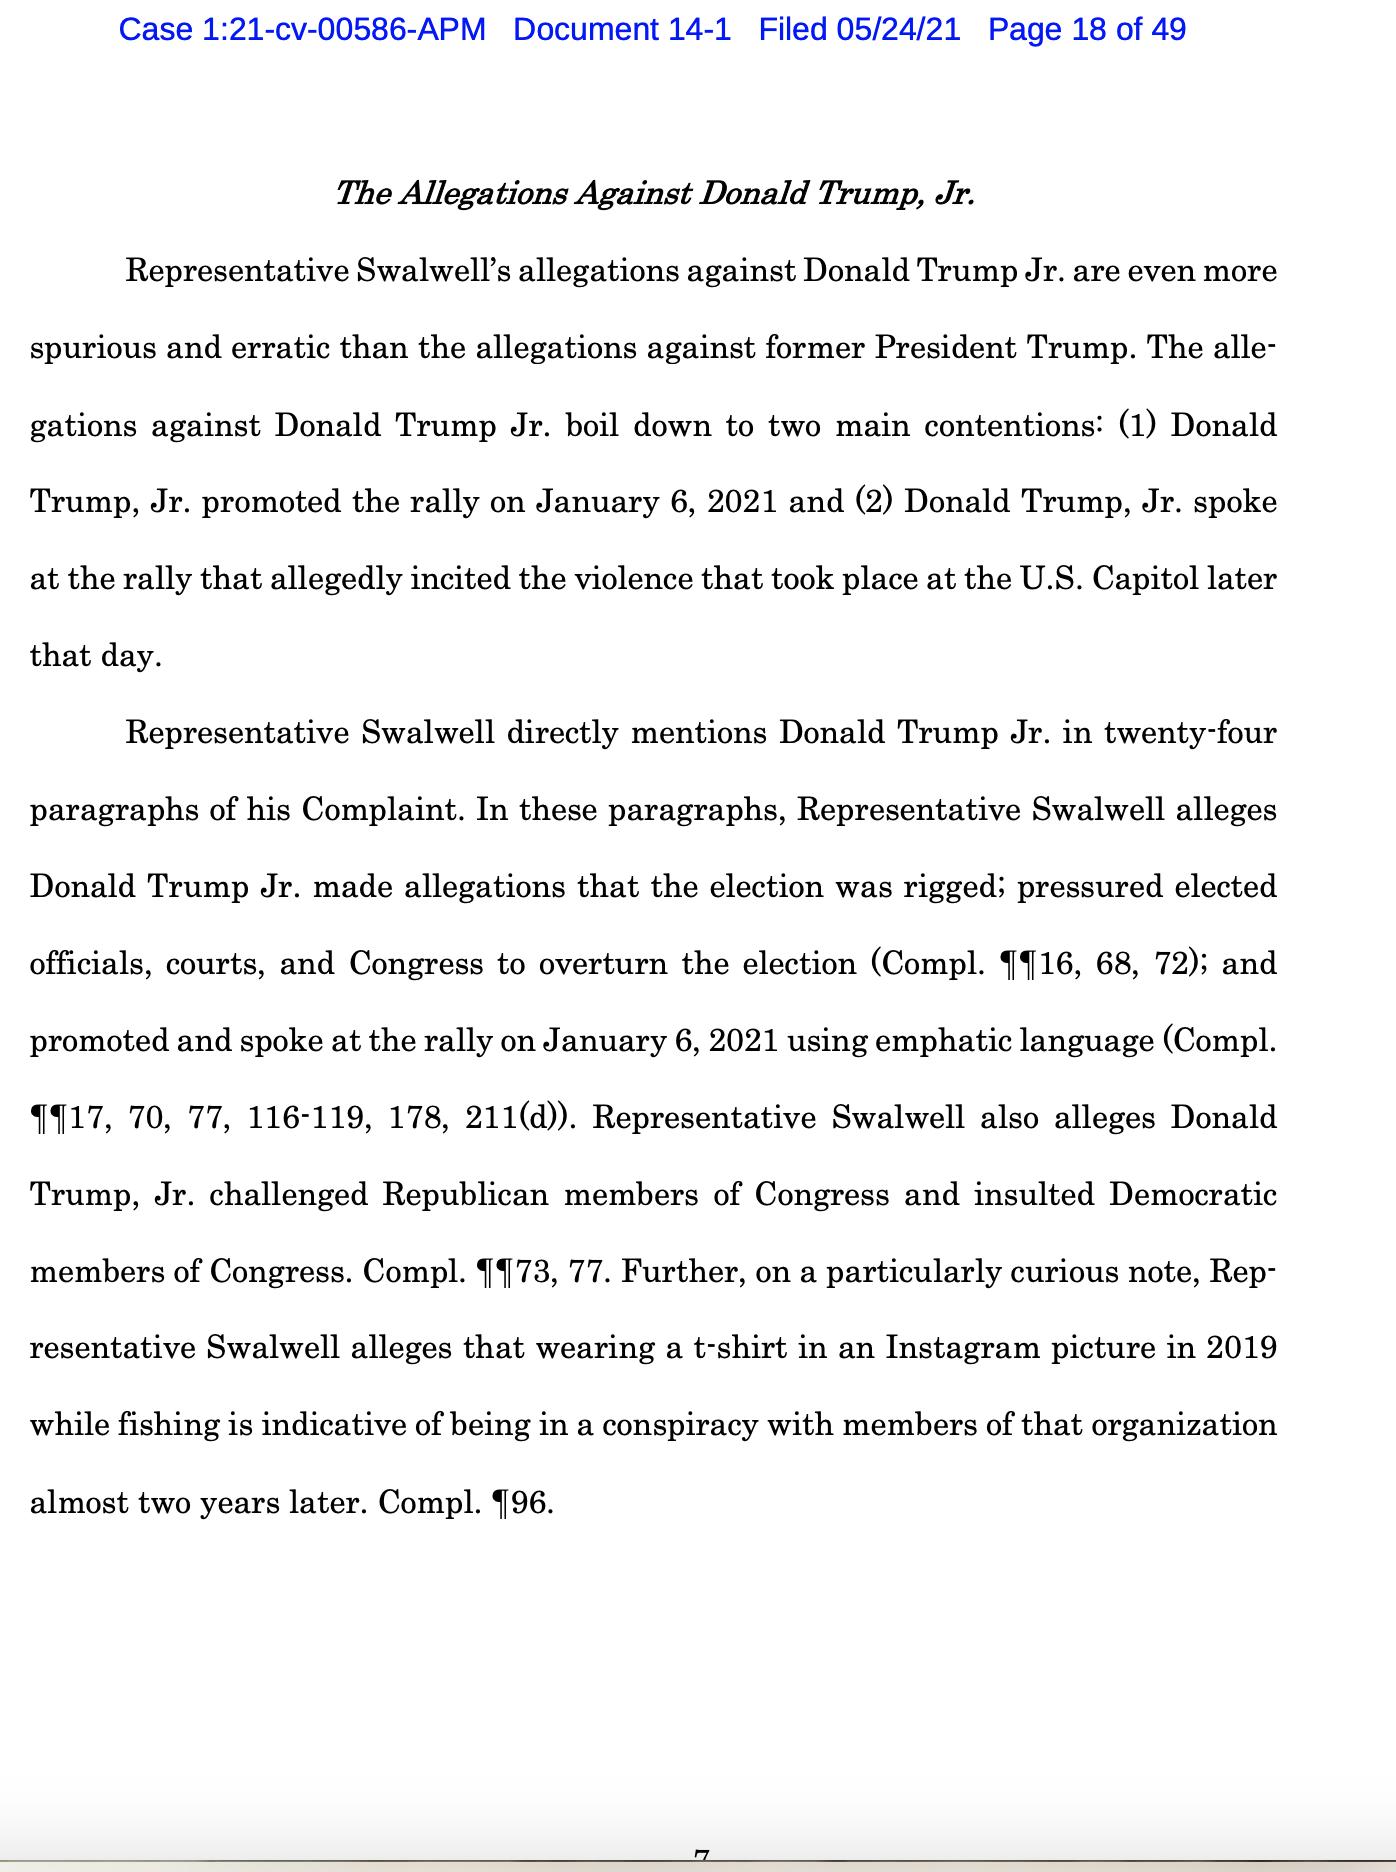 Screen-Shot-2021-05-25-at-9.50.14-AM Trump Declares Full Immunity From Jan. 6 Insurrection Lawsuit Crime Donald Trump Featured Politics Top Stories